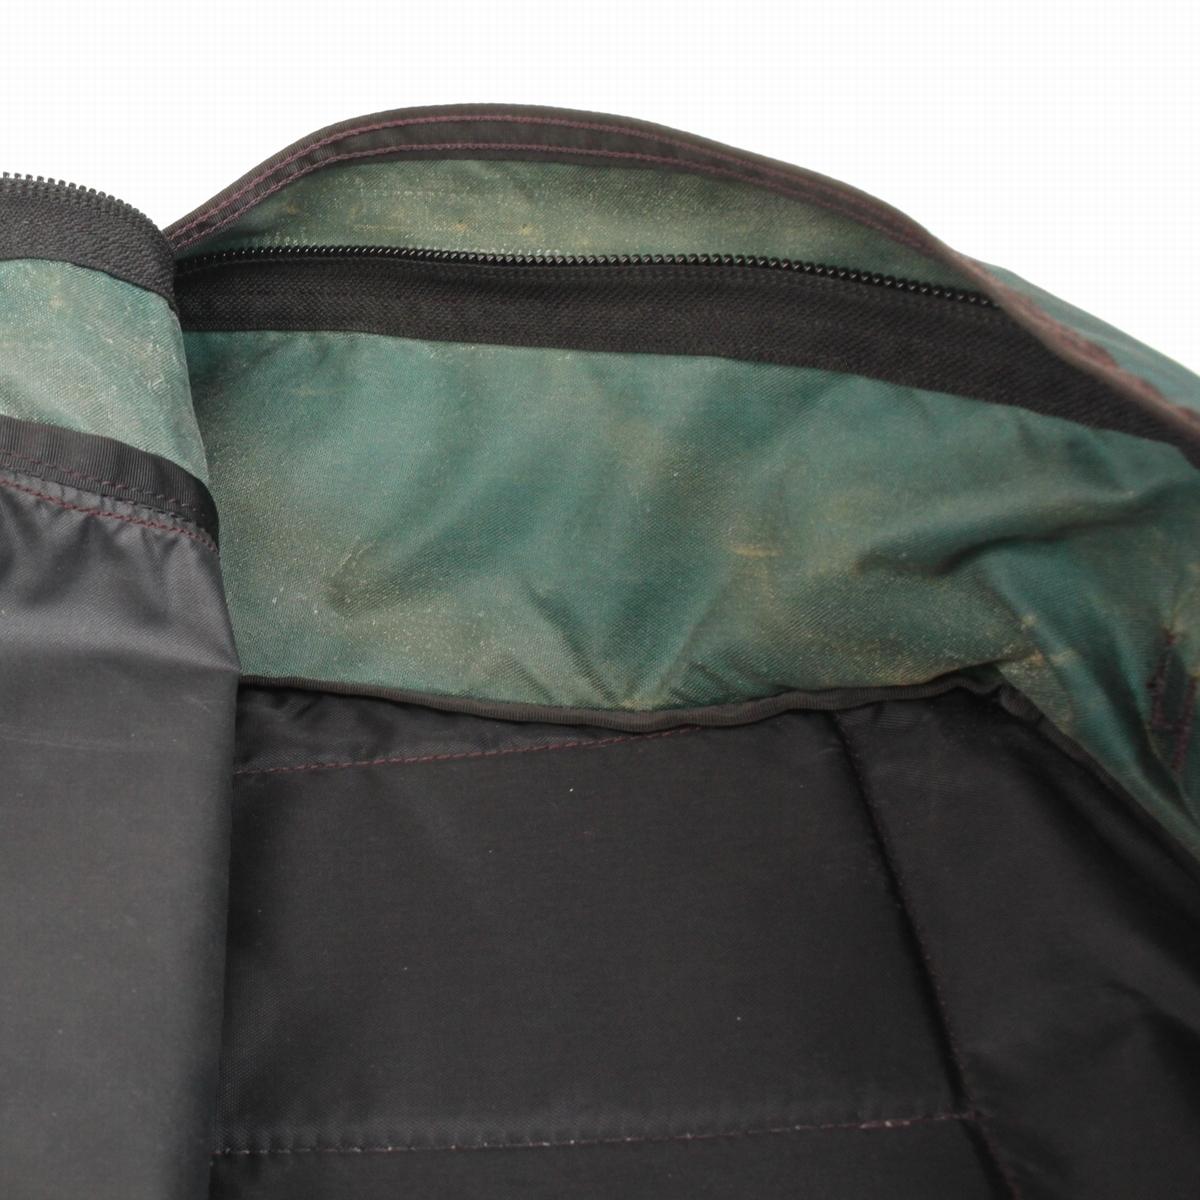 (yk80308)極上91年頃製 紫タグGREGORYグレゴリーMADE IN USAデイ バックパック 旧ロゴ アメリカ製 深緑 ダークグリーン パープルタグ_画像10